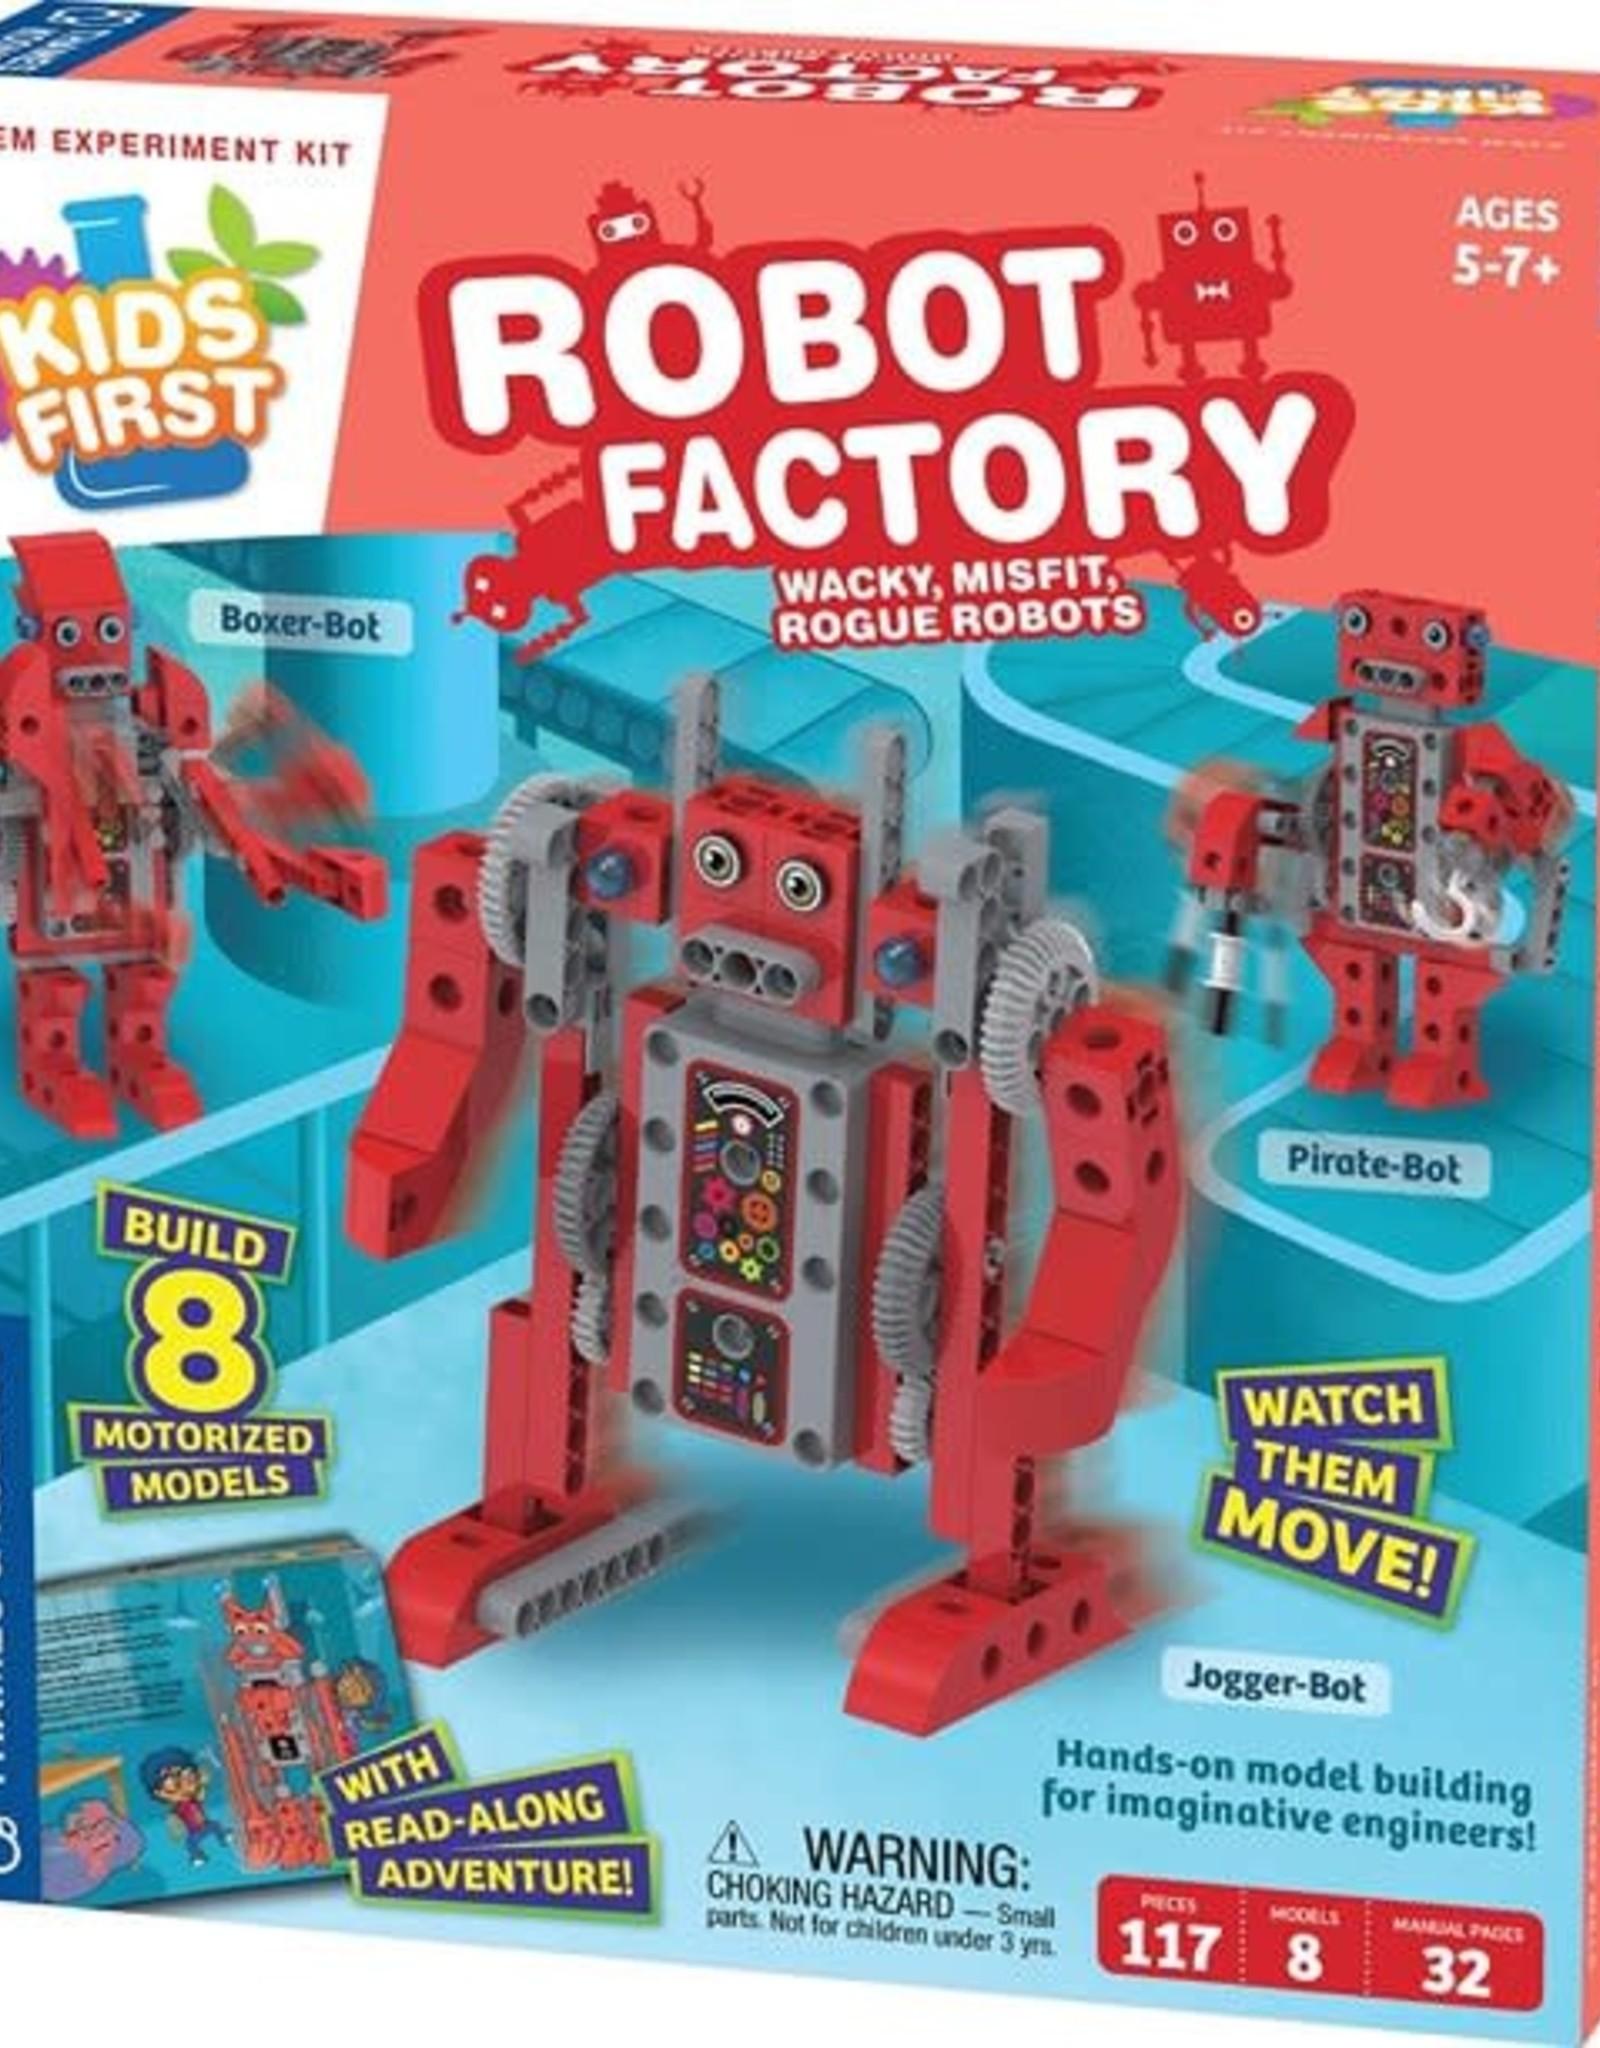 Thames and Kosmos Kids First Robot Factory: Wacky, Misfit, Rogue Robots